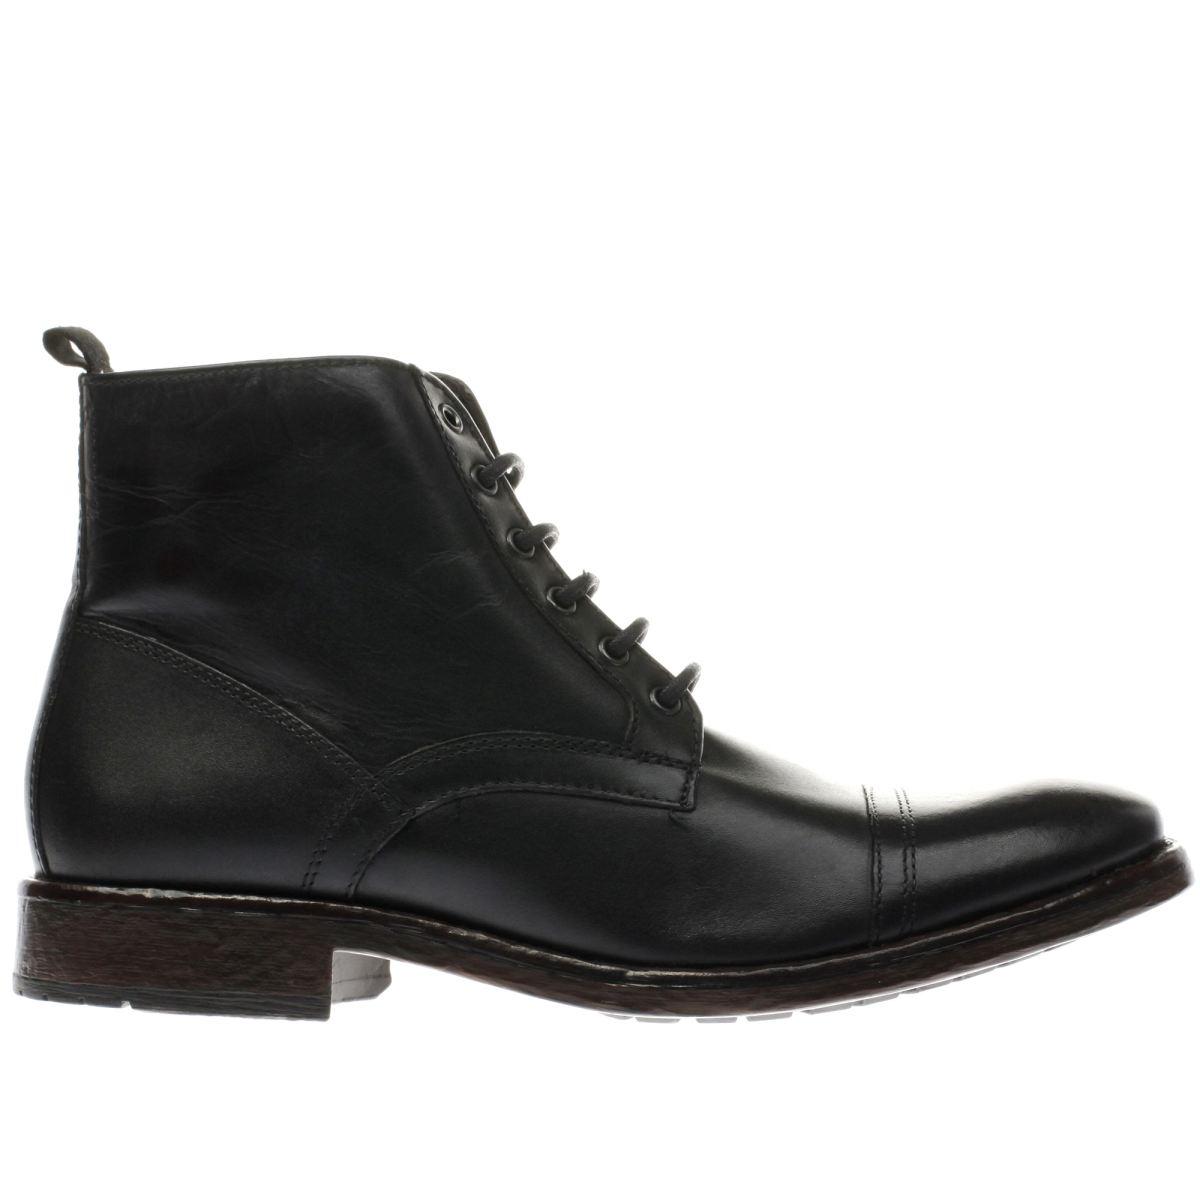 Ikon Ikon Black Drake Cap Boots